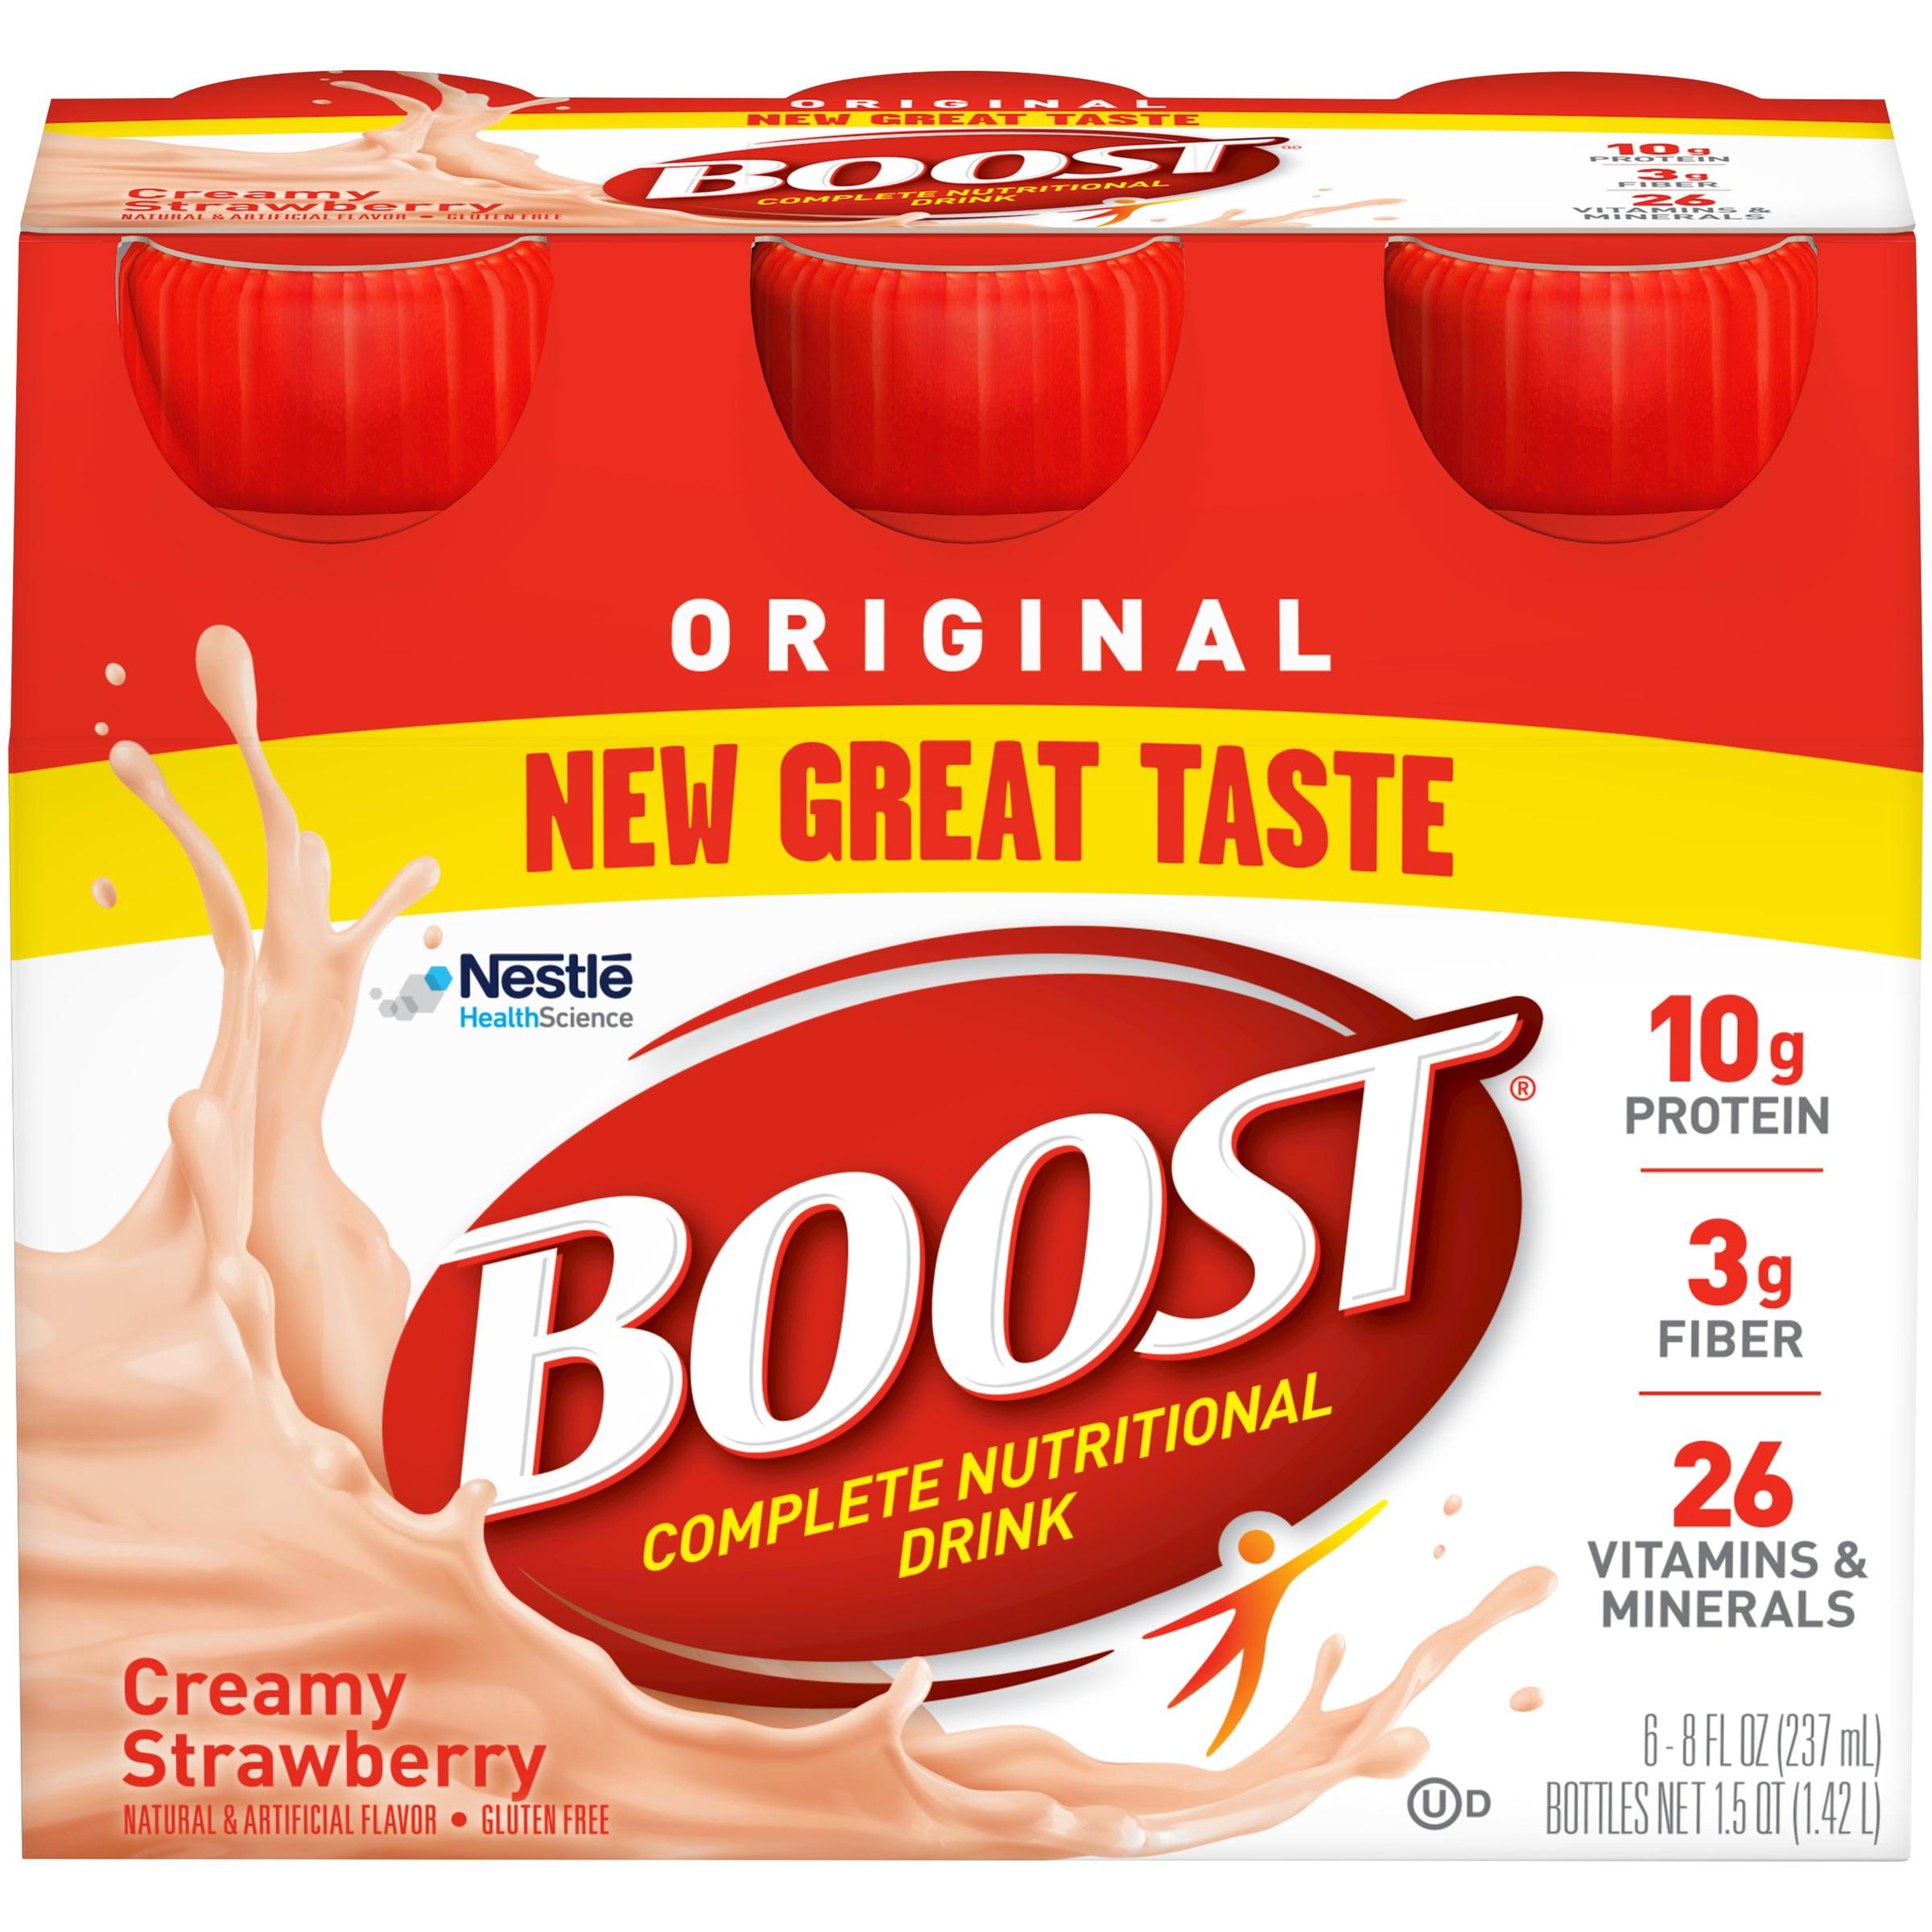 BOOST ORIGINAL Creamy Strawberry 6-8 fl. oz. Bottles